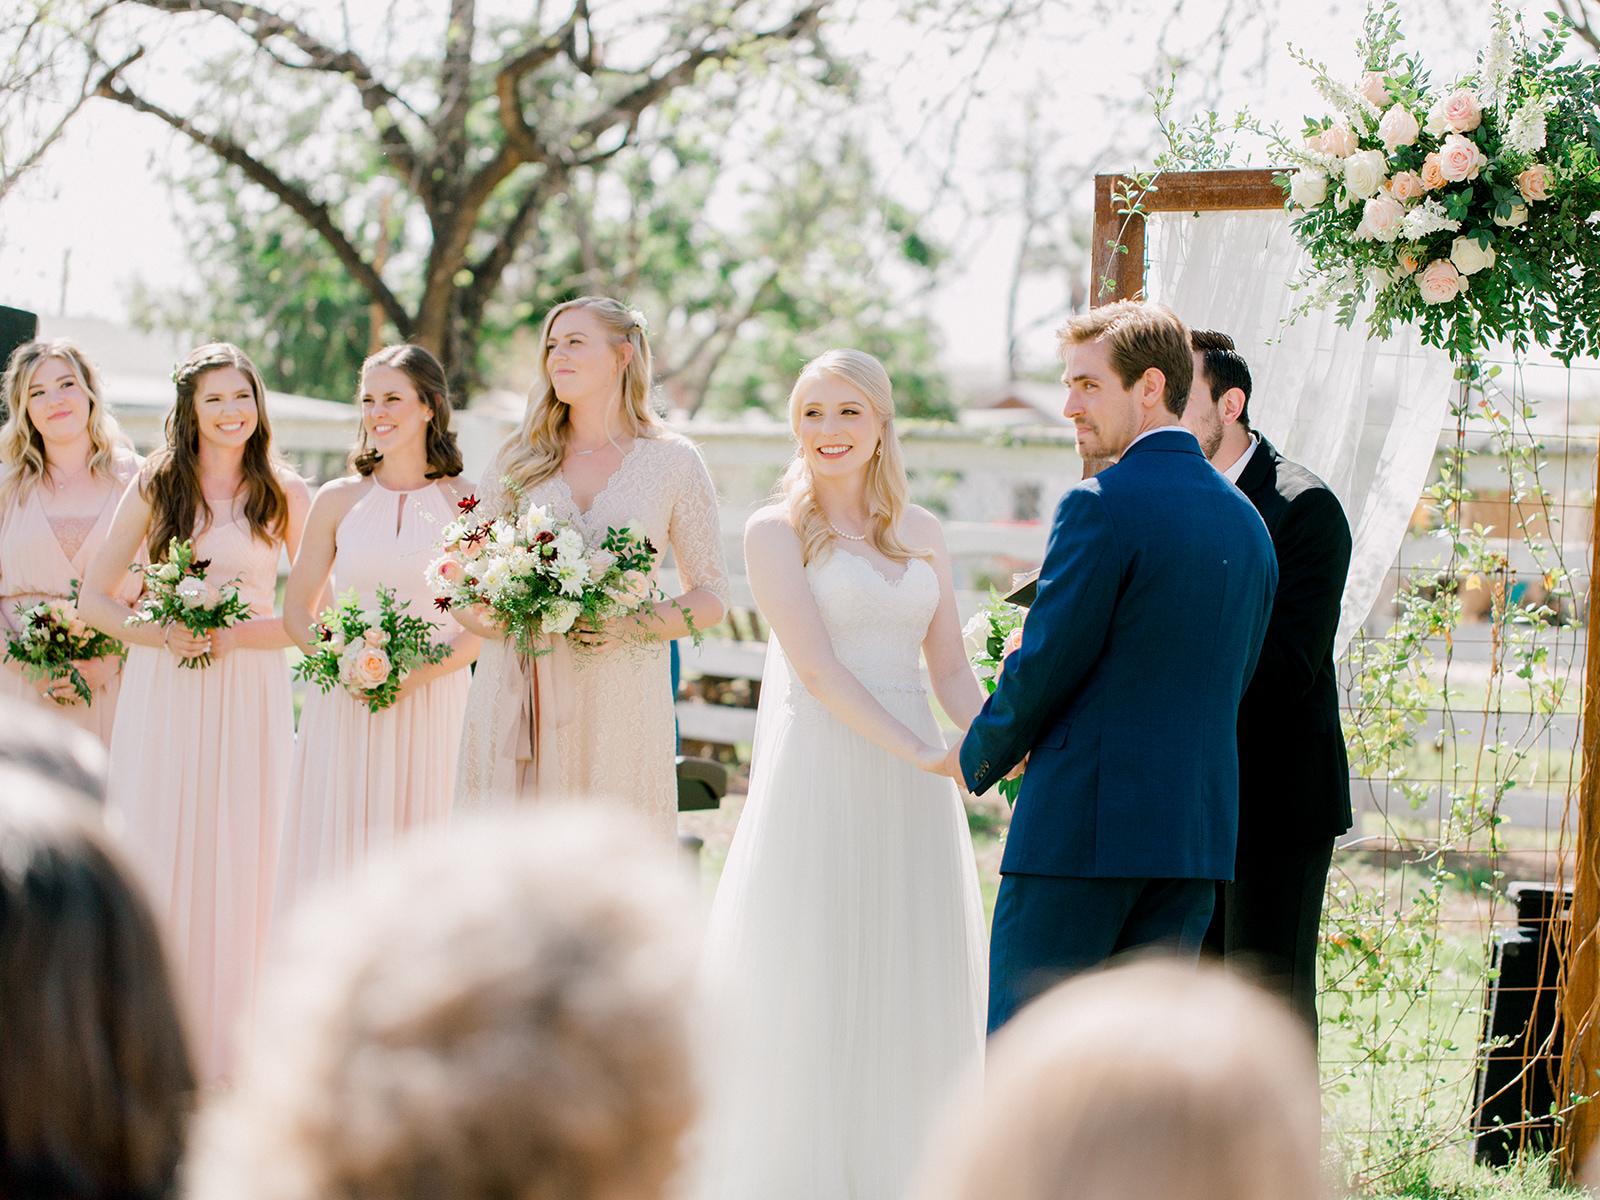 Lukas Wedding - Ceremony-134.jpg